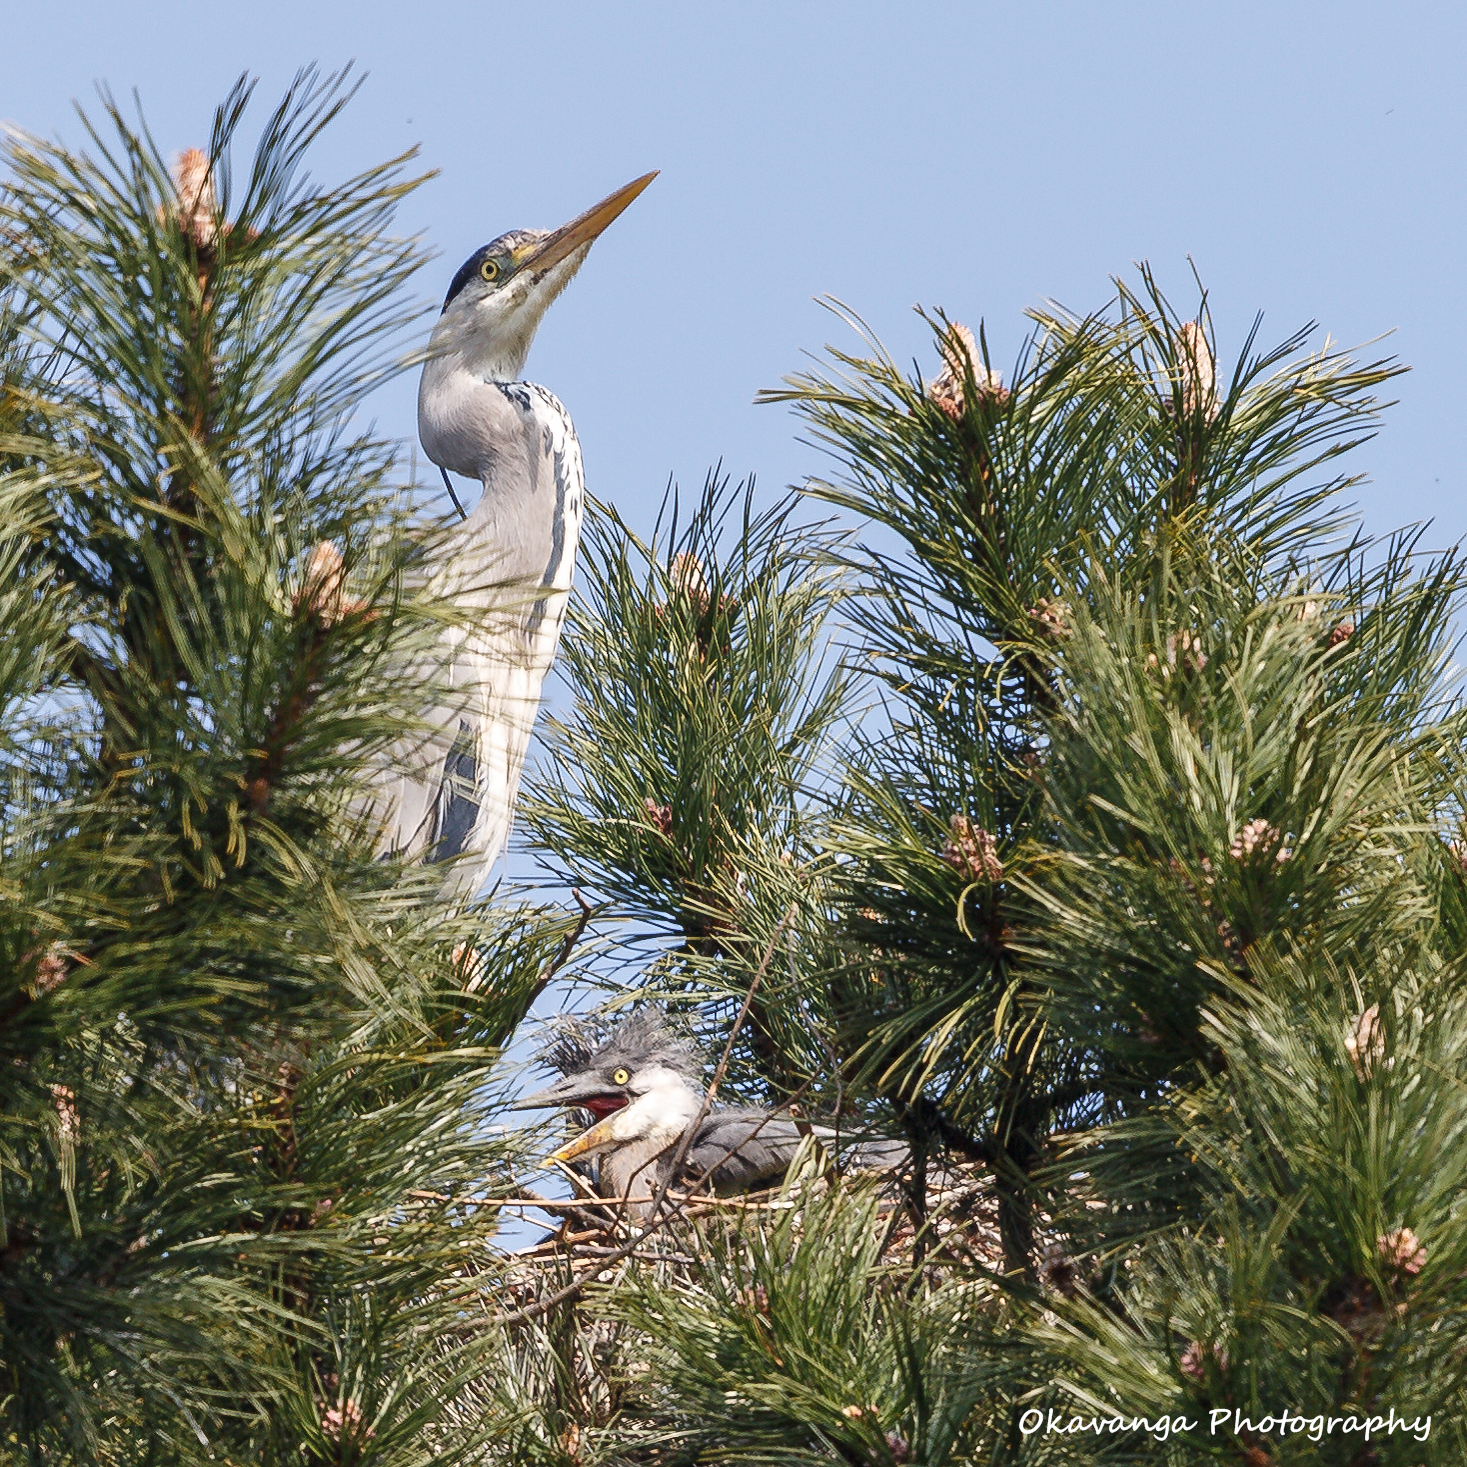 Heron 6 - Nothing Like a Good Squawk! by Okavanga